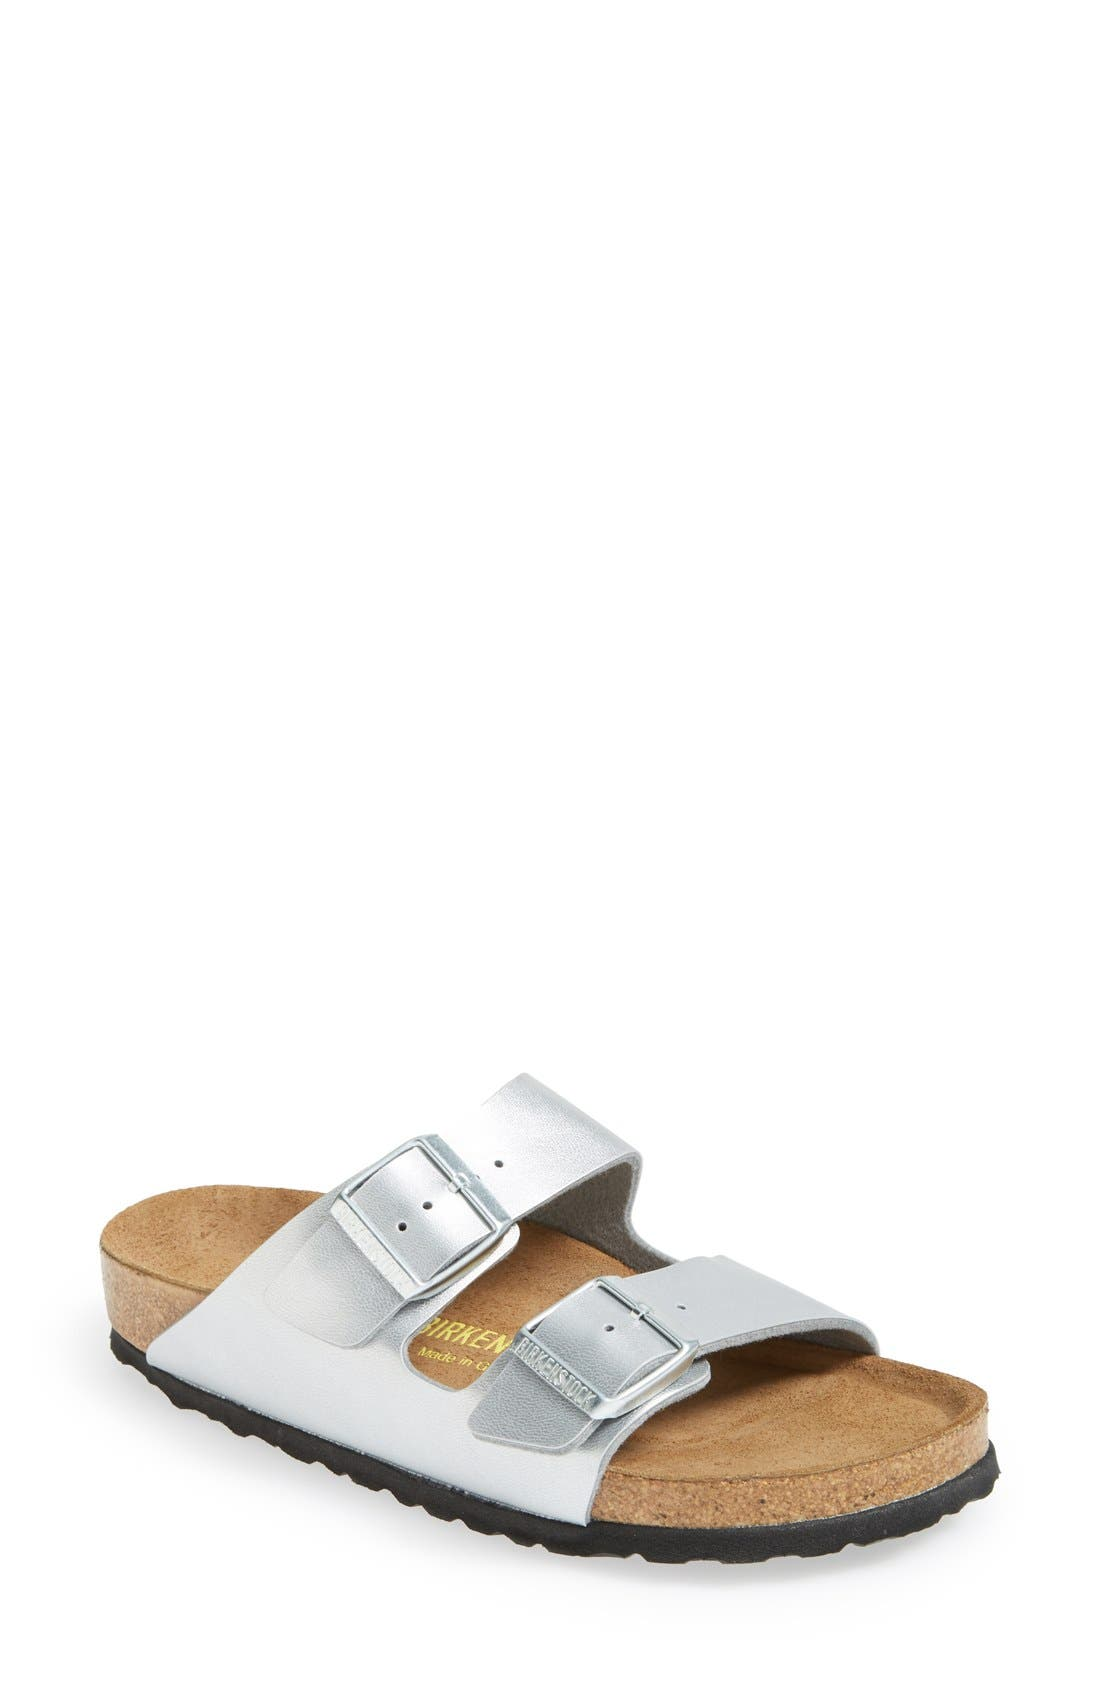 'Arizona Birko-Flor' Soft Footbed Sandal,                             Main thumbnail 1, color,                             Silver